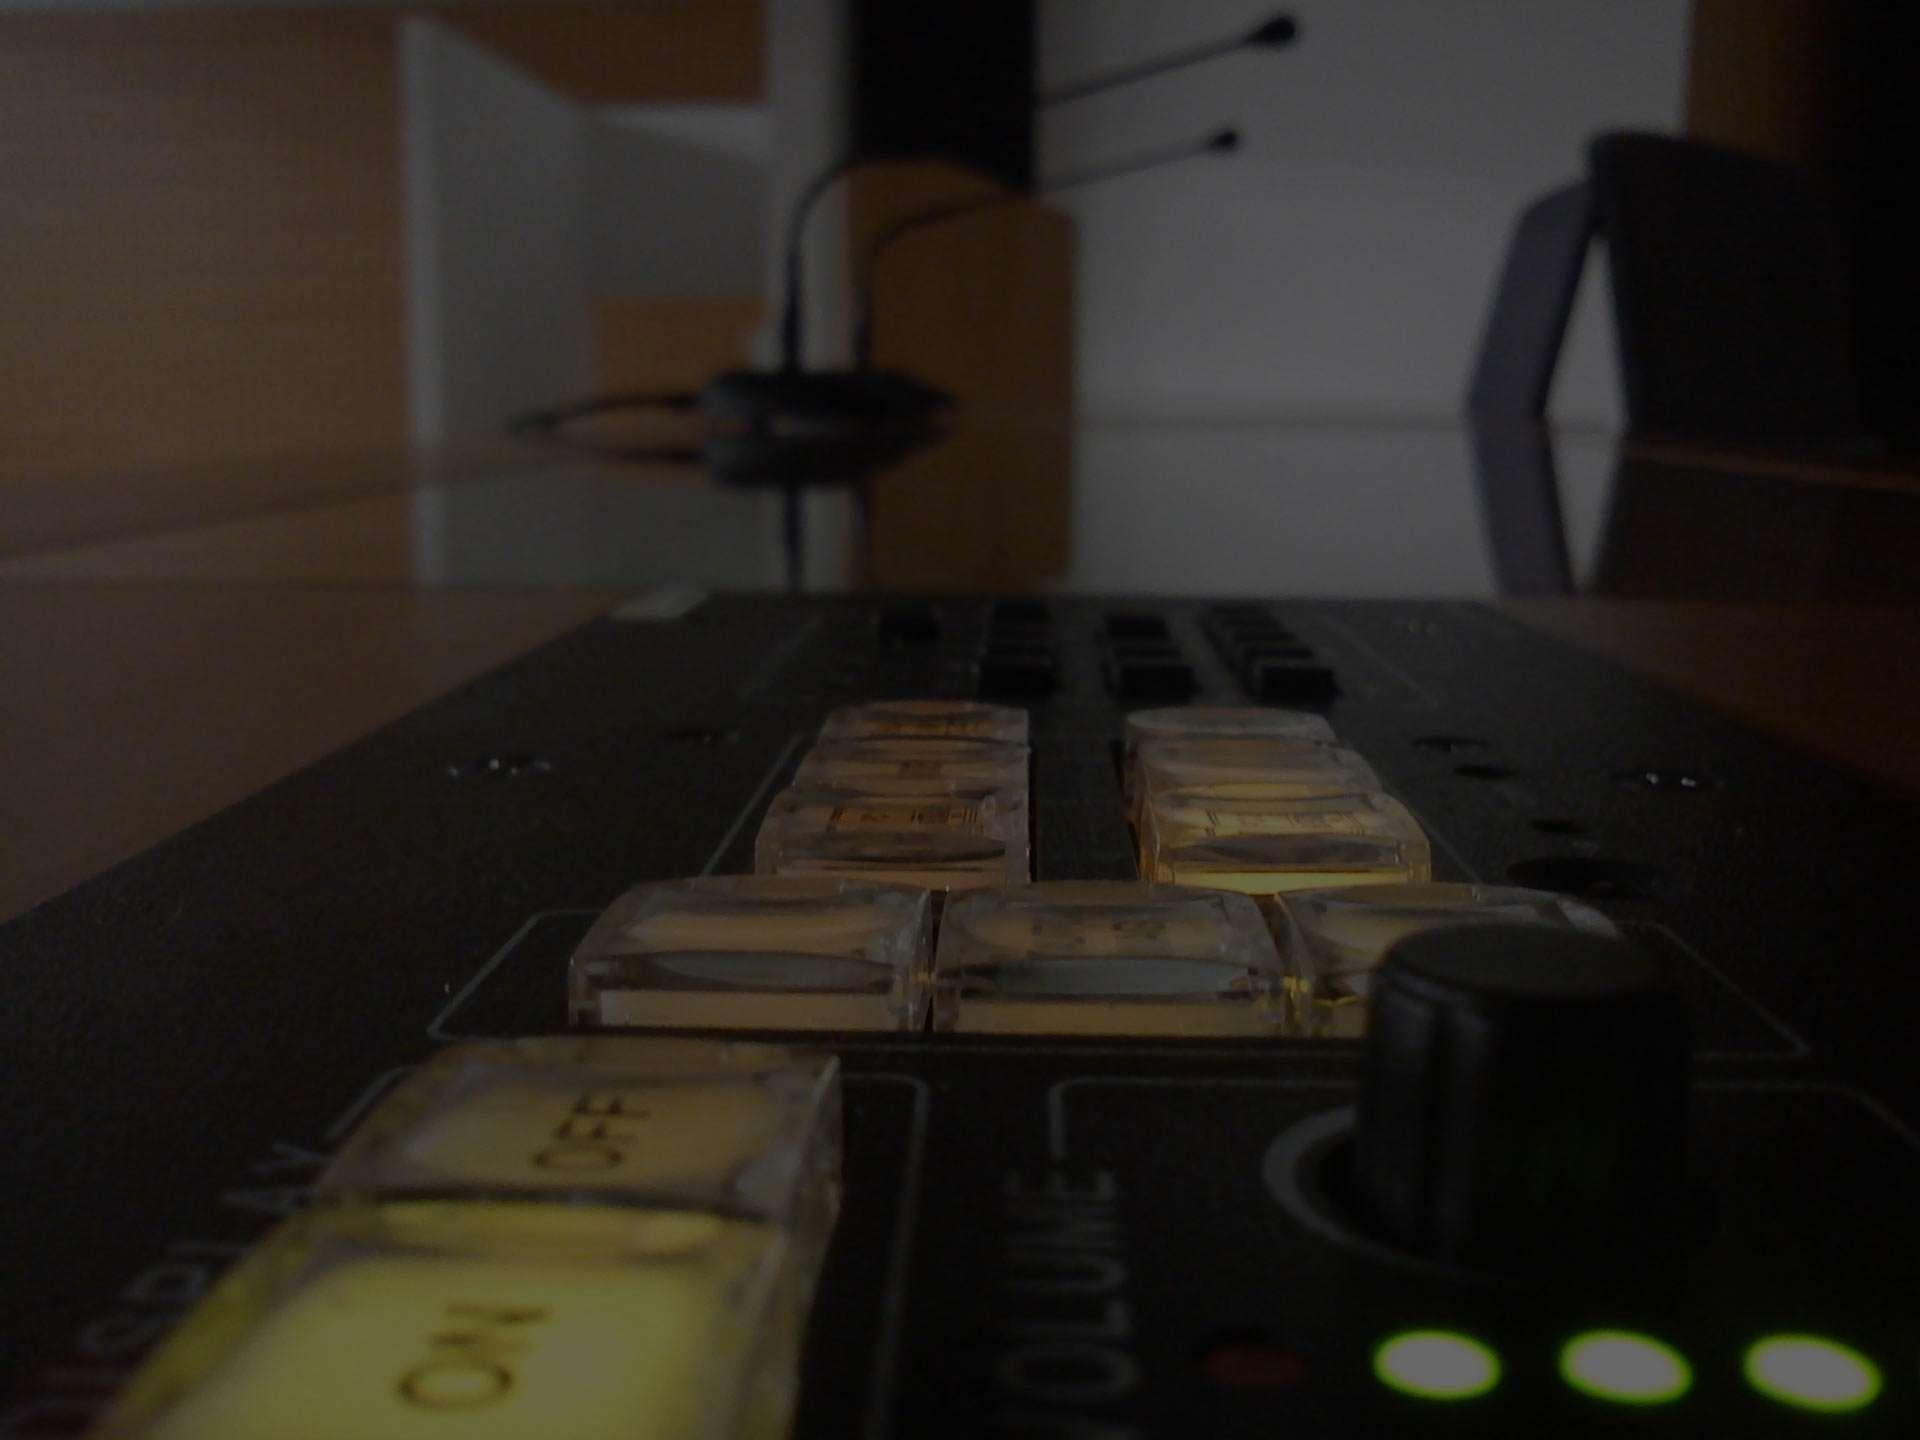 soluciones audiovisuales málaga